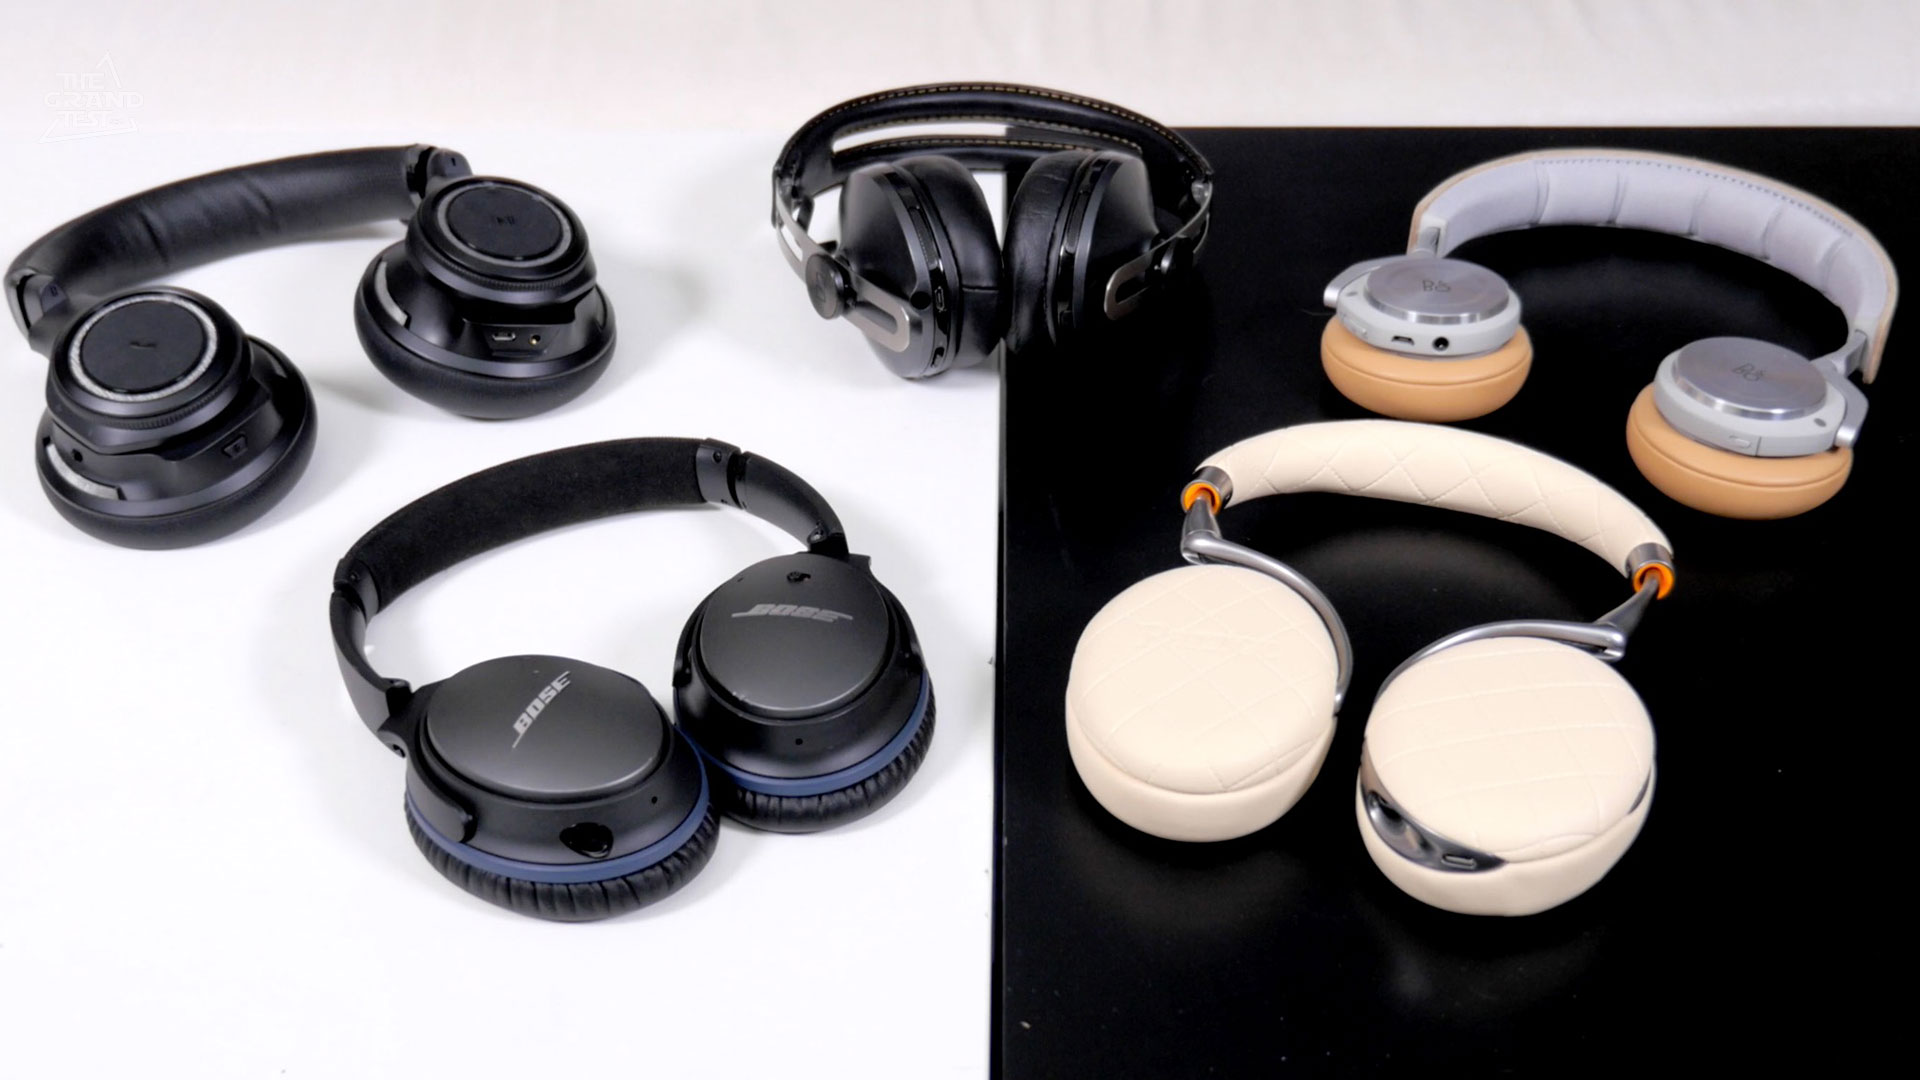 casque bluetooth reducteur de bruit